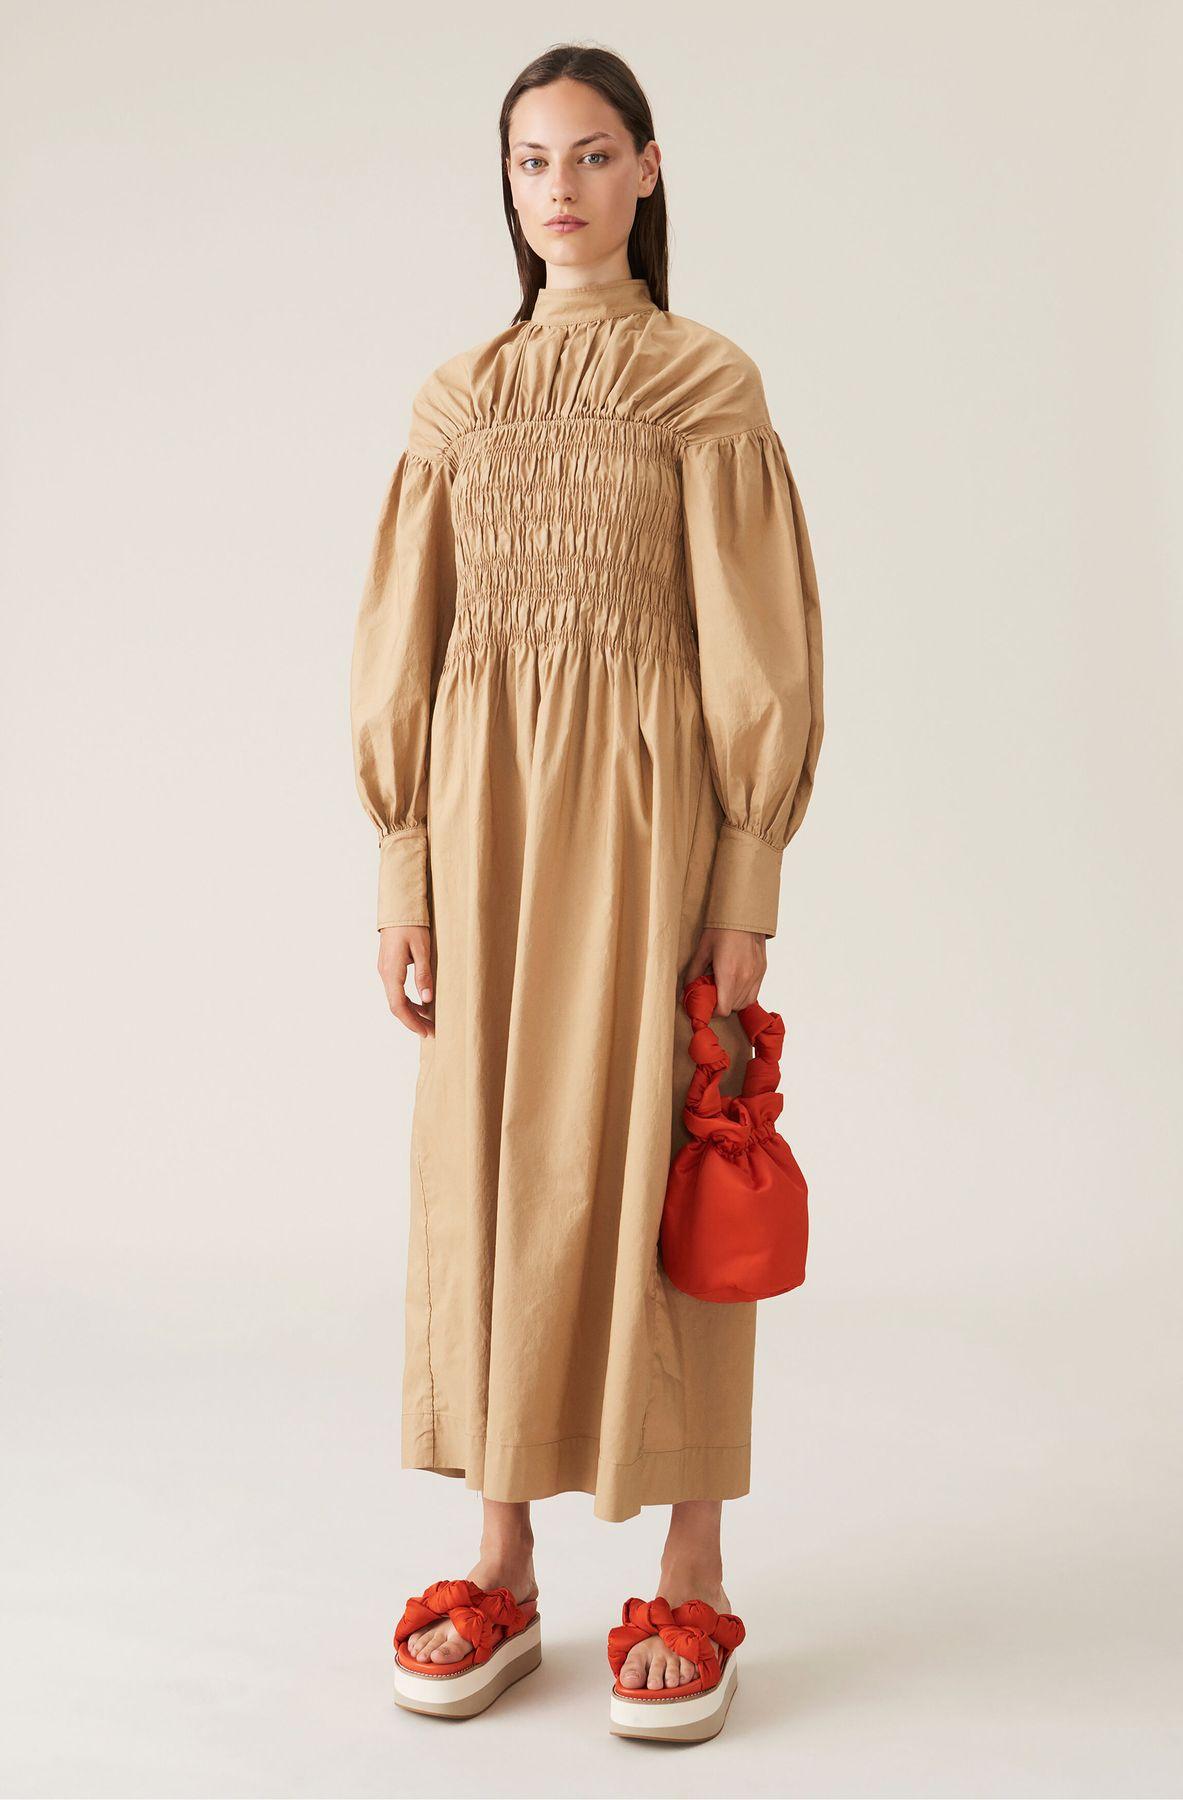 Pilot Client_Caughley model wears Ganni dress.